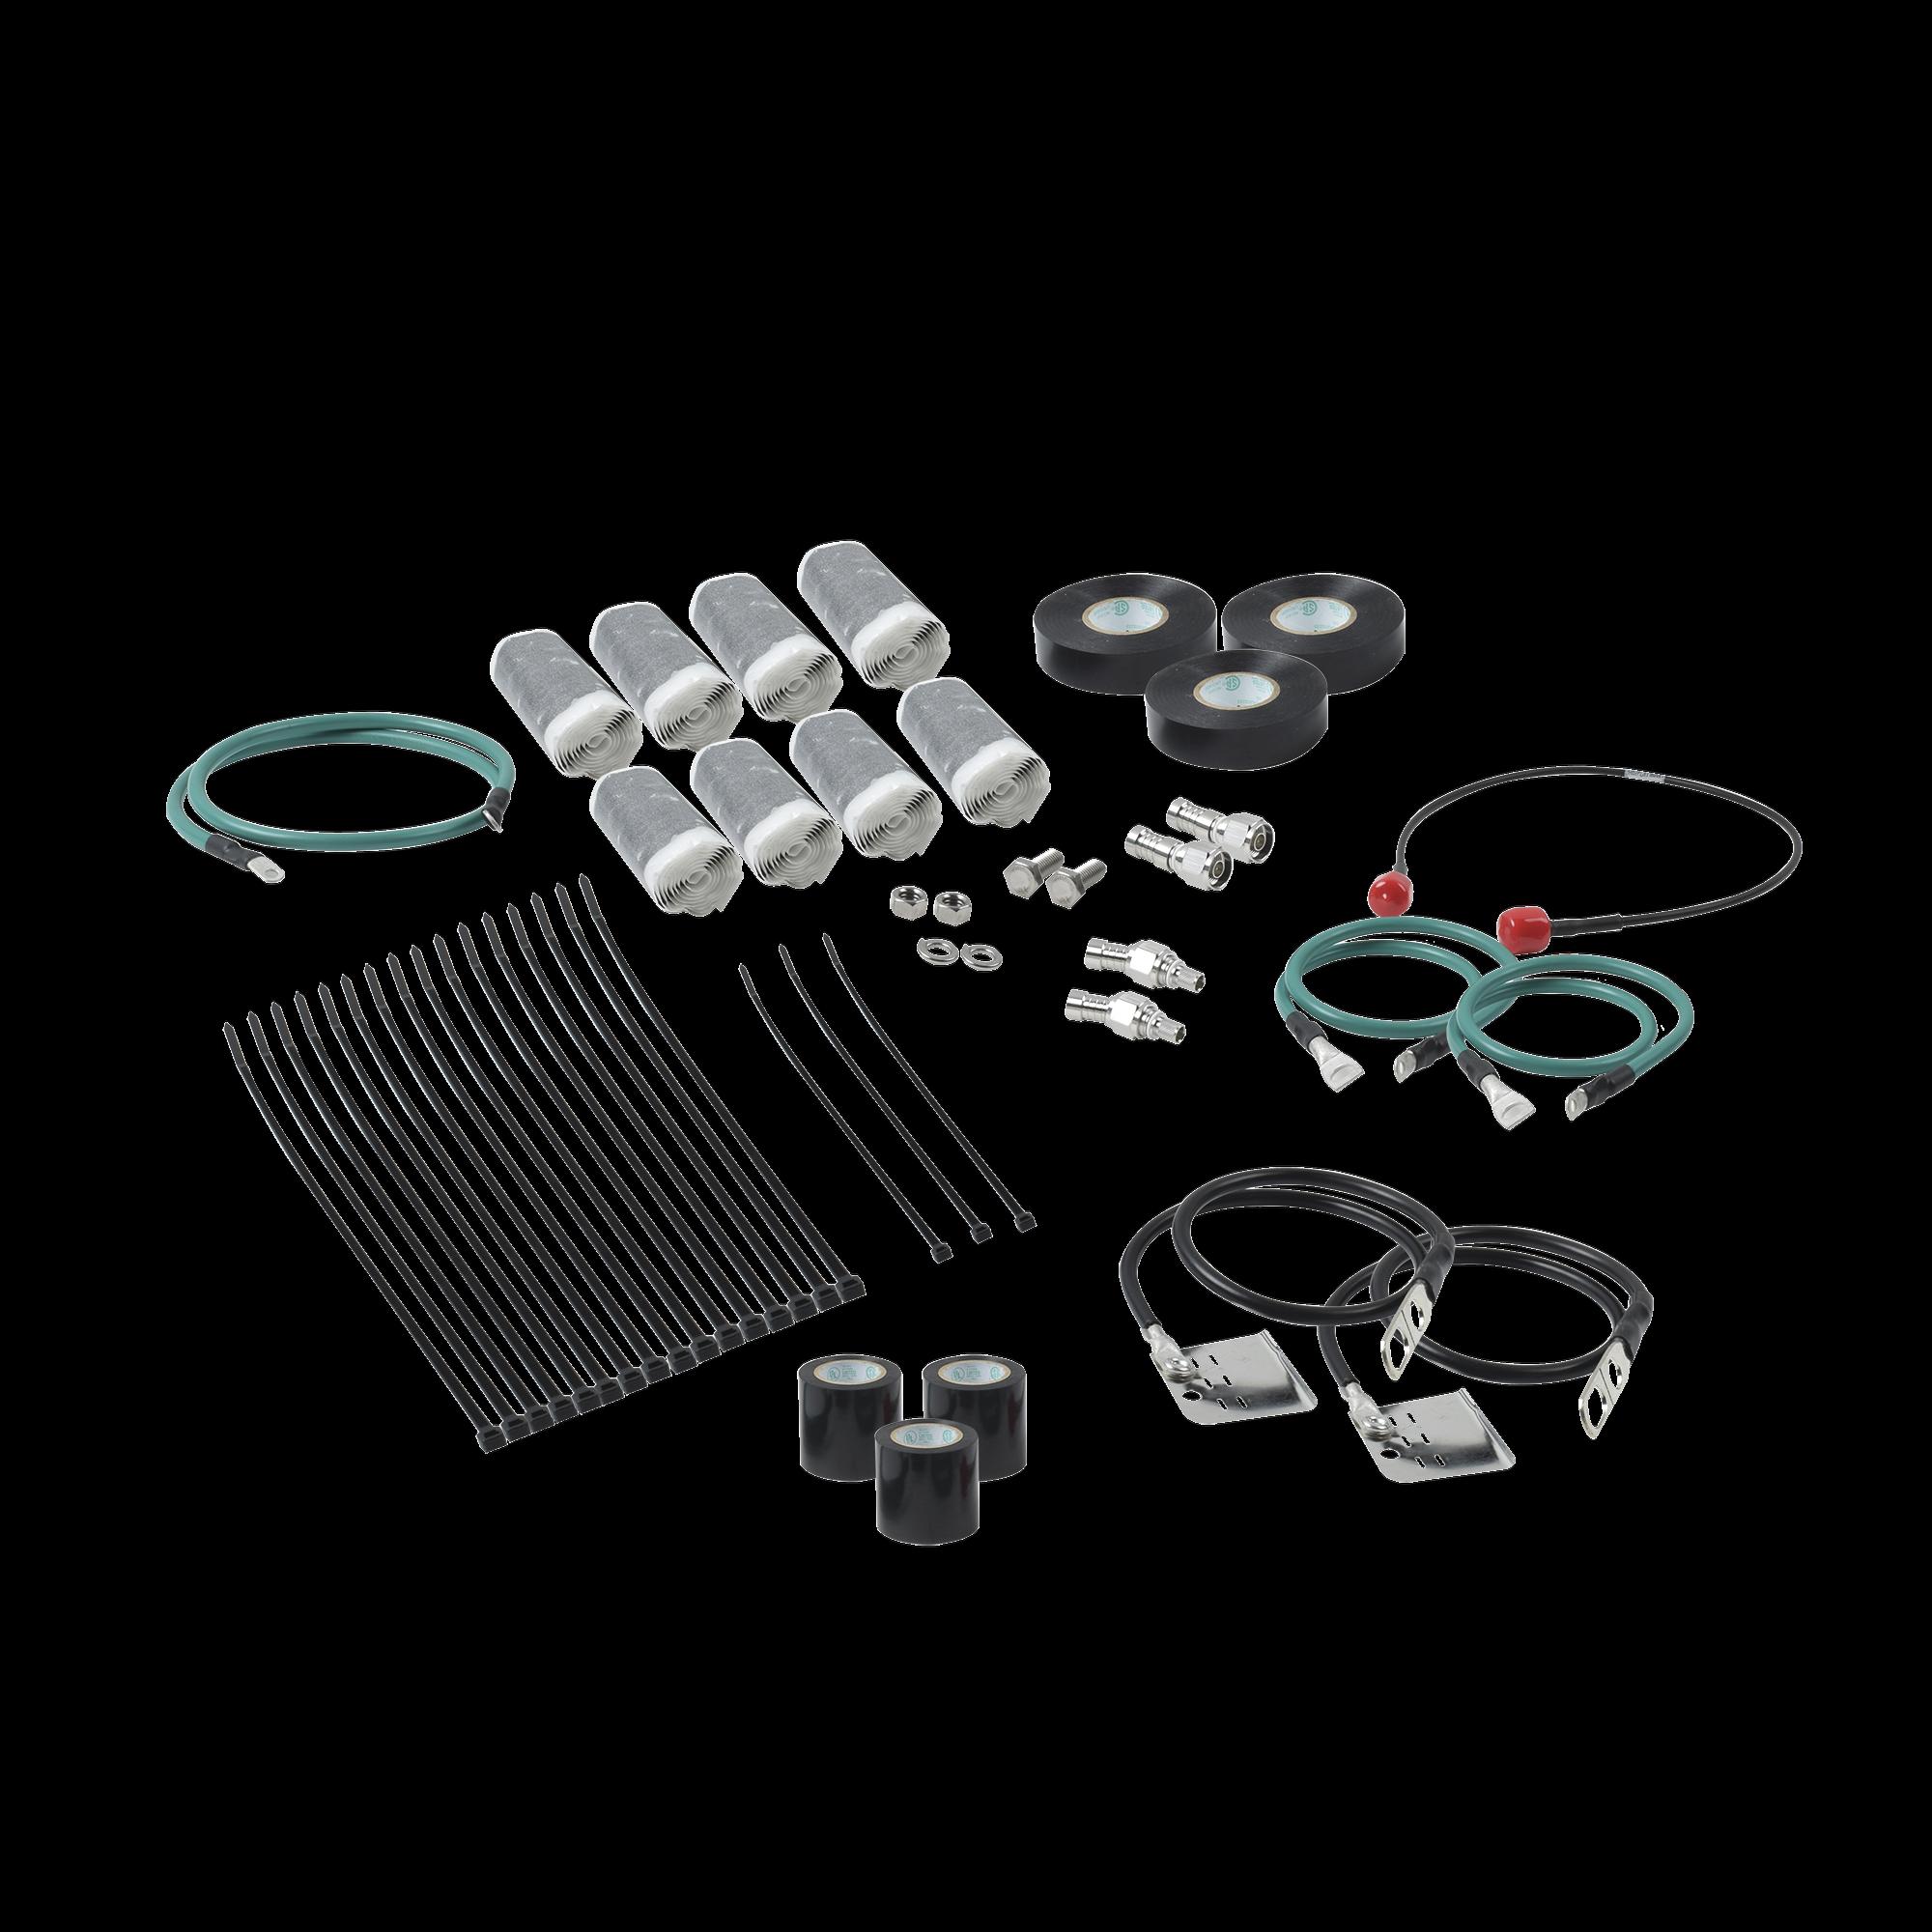 Kit de instalación para cable coaxial para proyectos PTP 820